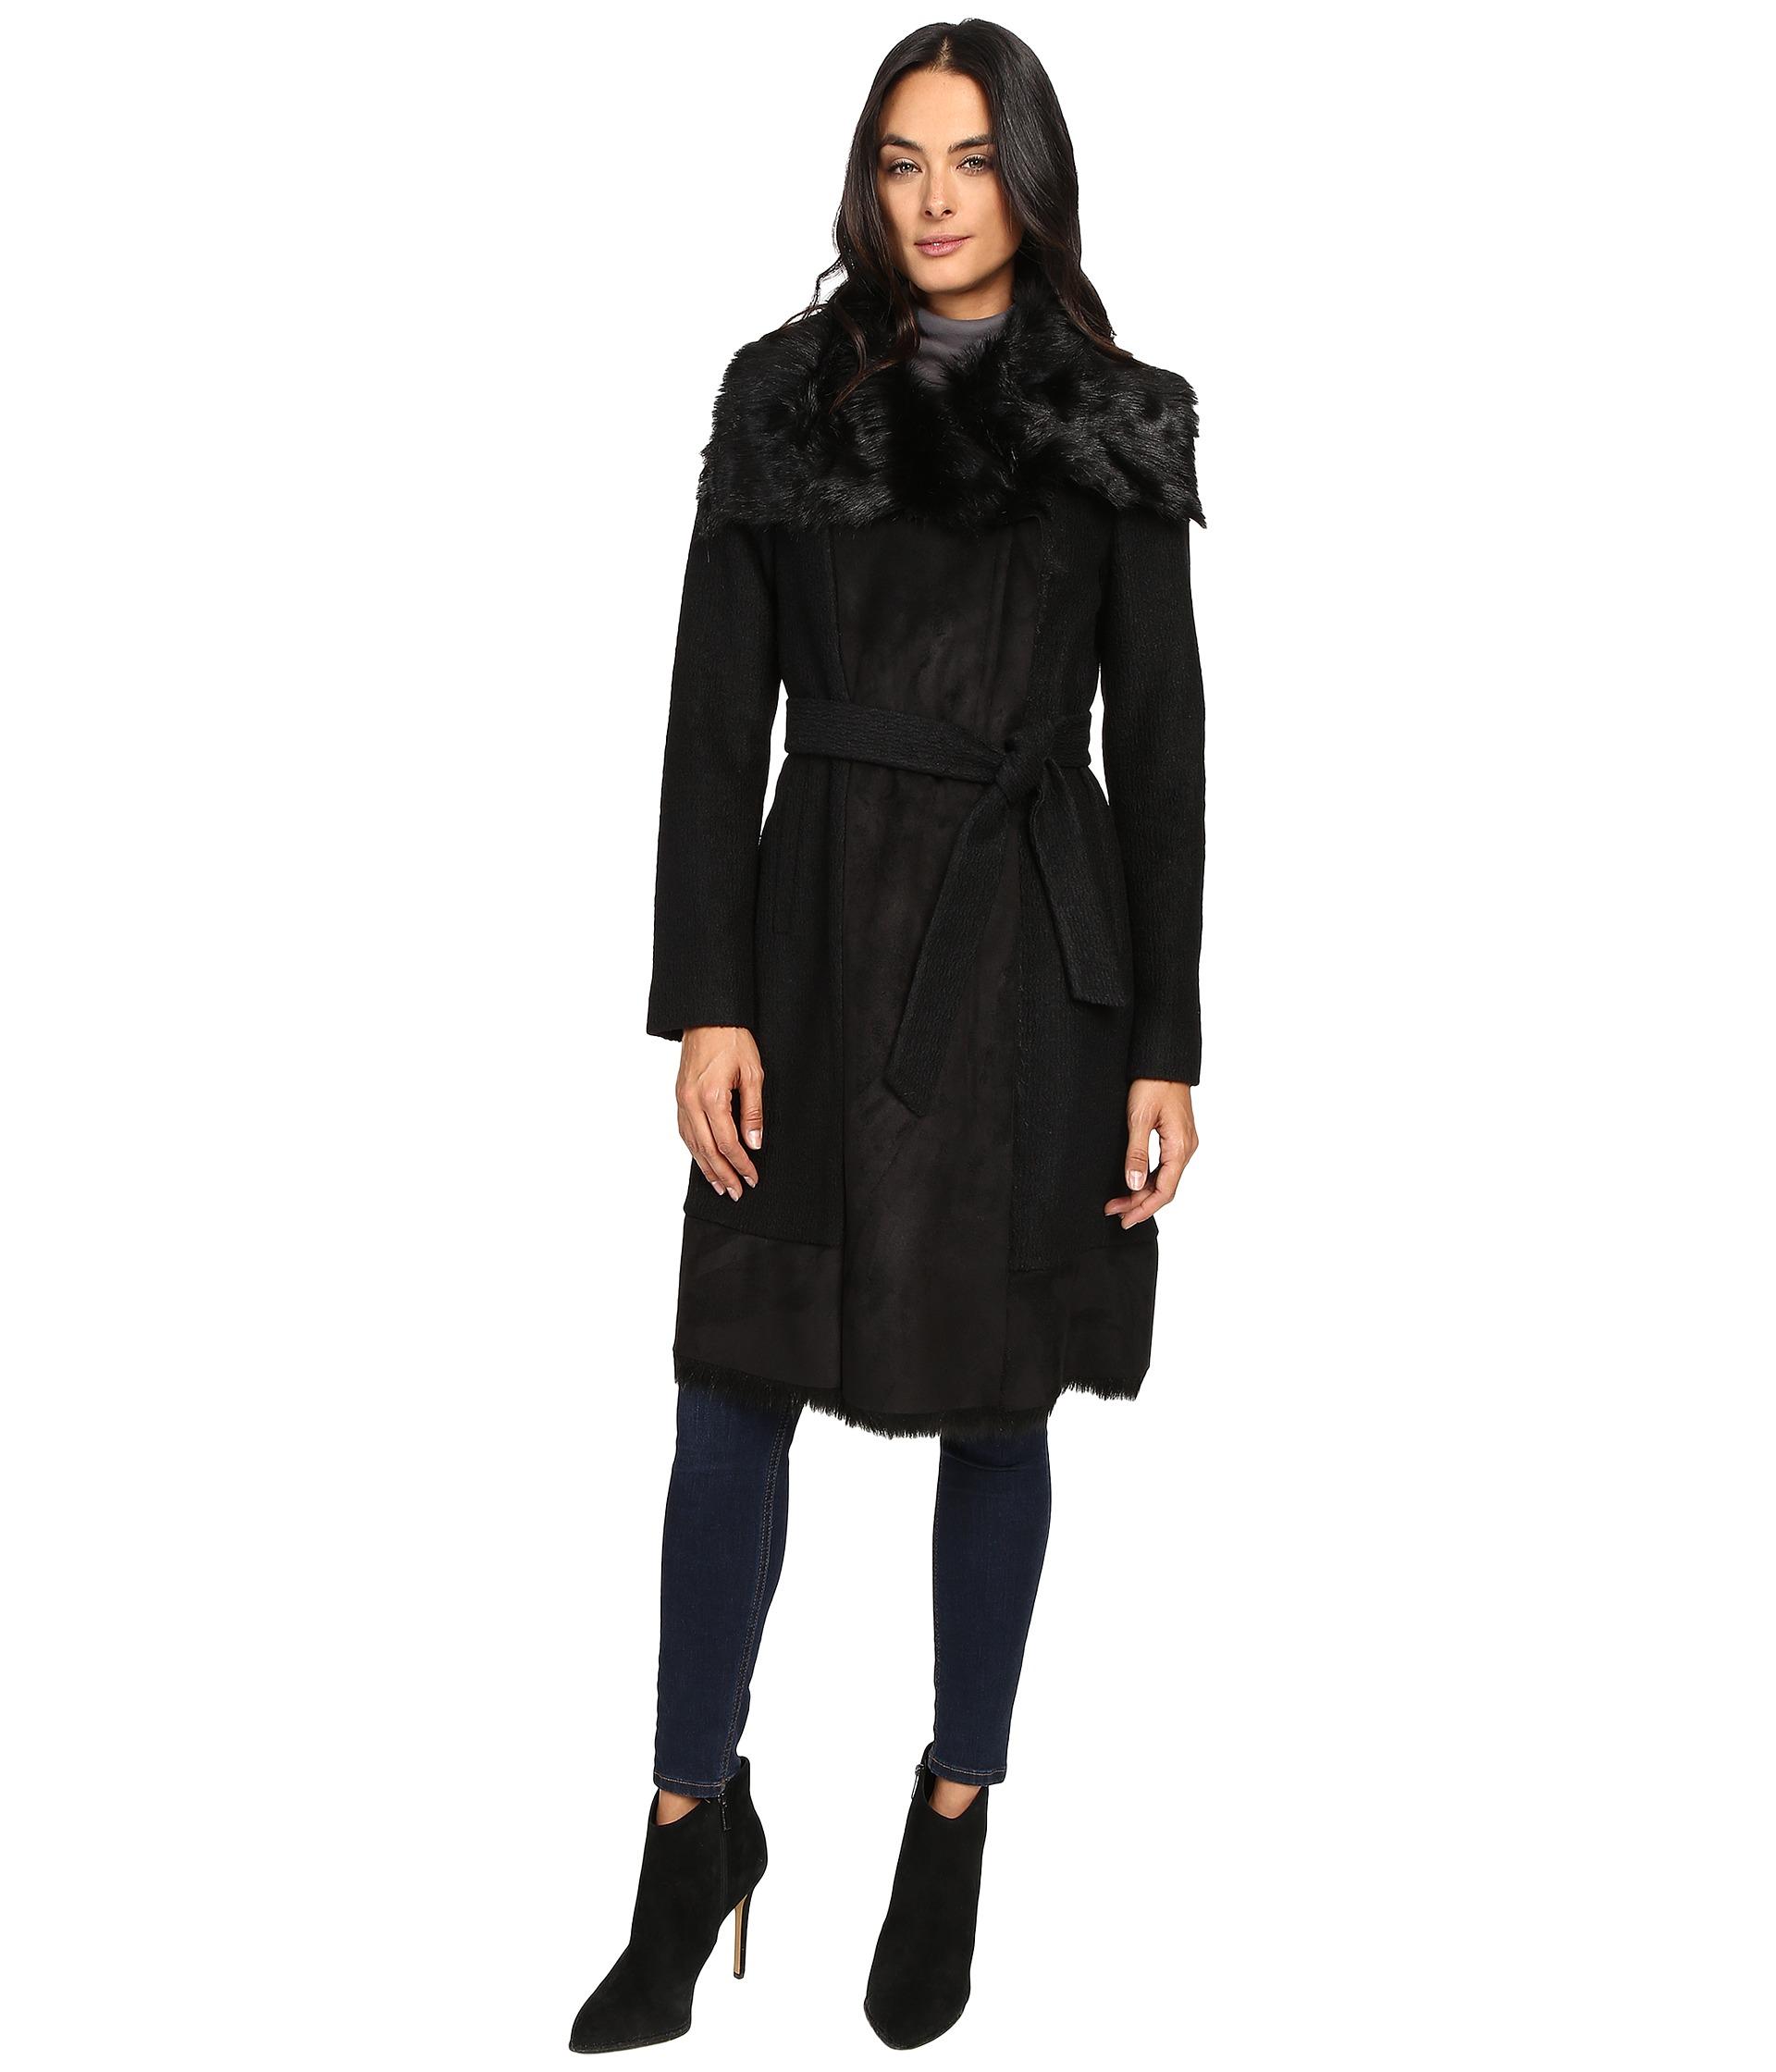 Wool Coat | Shipped Free at Zappos